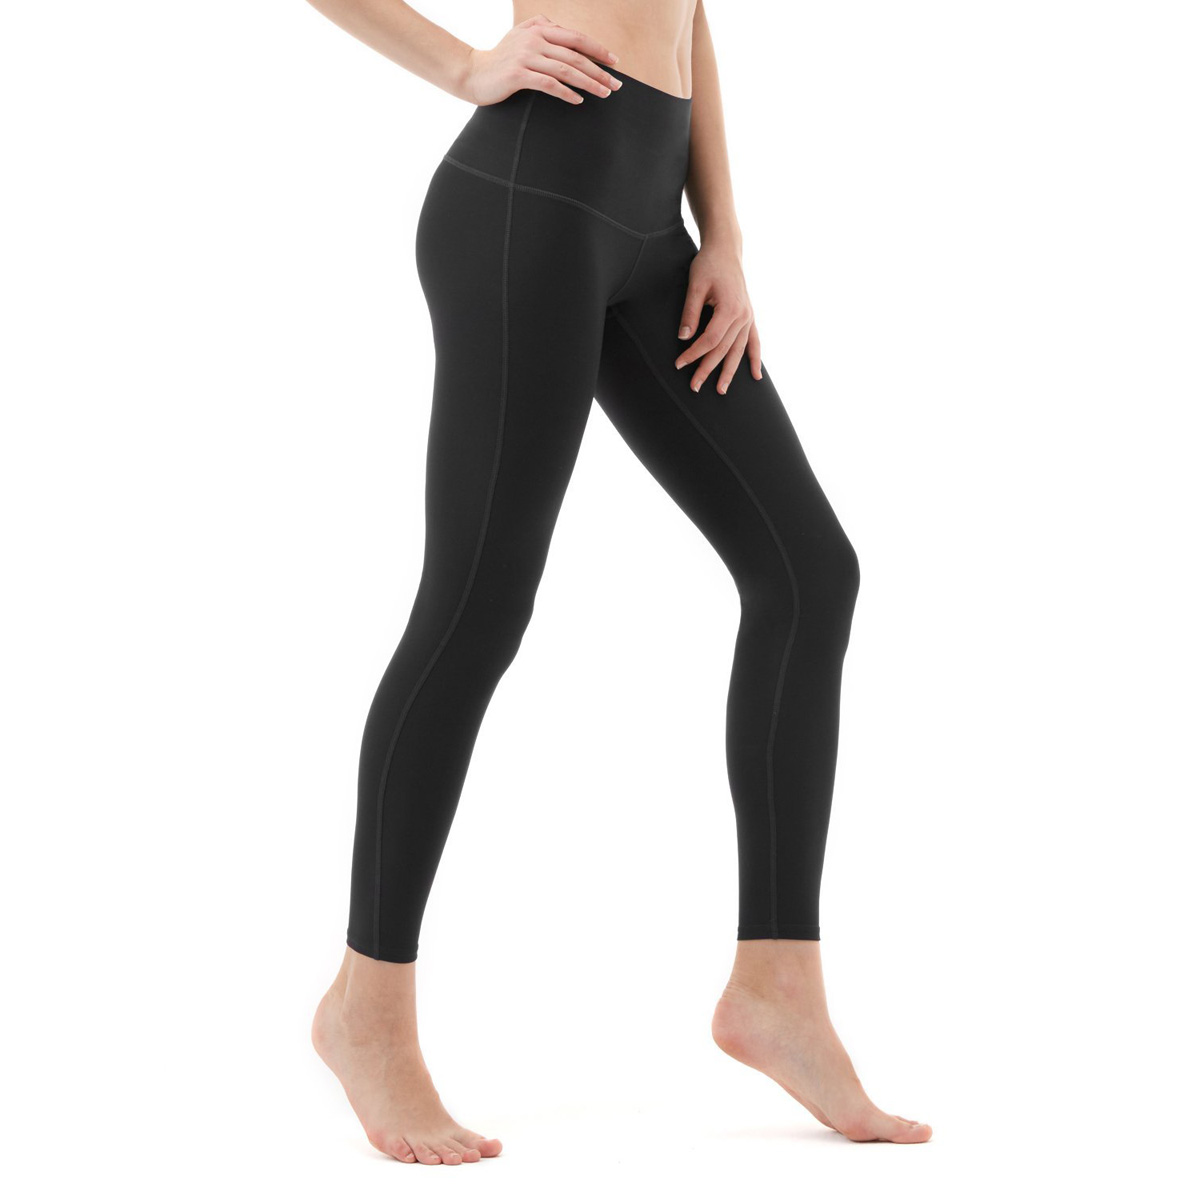 thumbnail 21 - TSLA Tesla FYP42 Women's High-Waisted Ultra-Stretch Tummy Control Yoga Pants